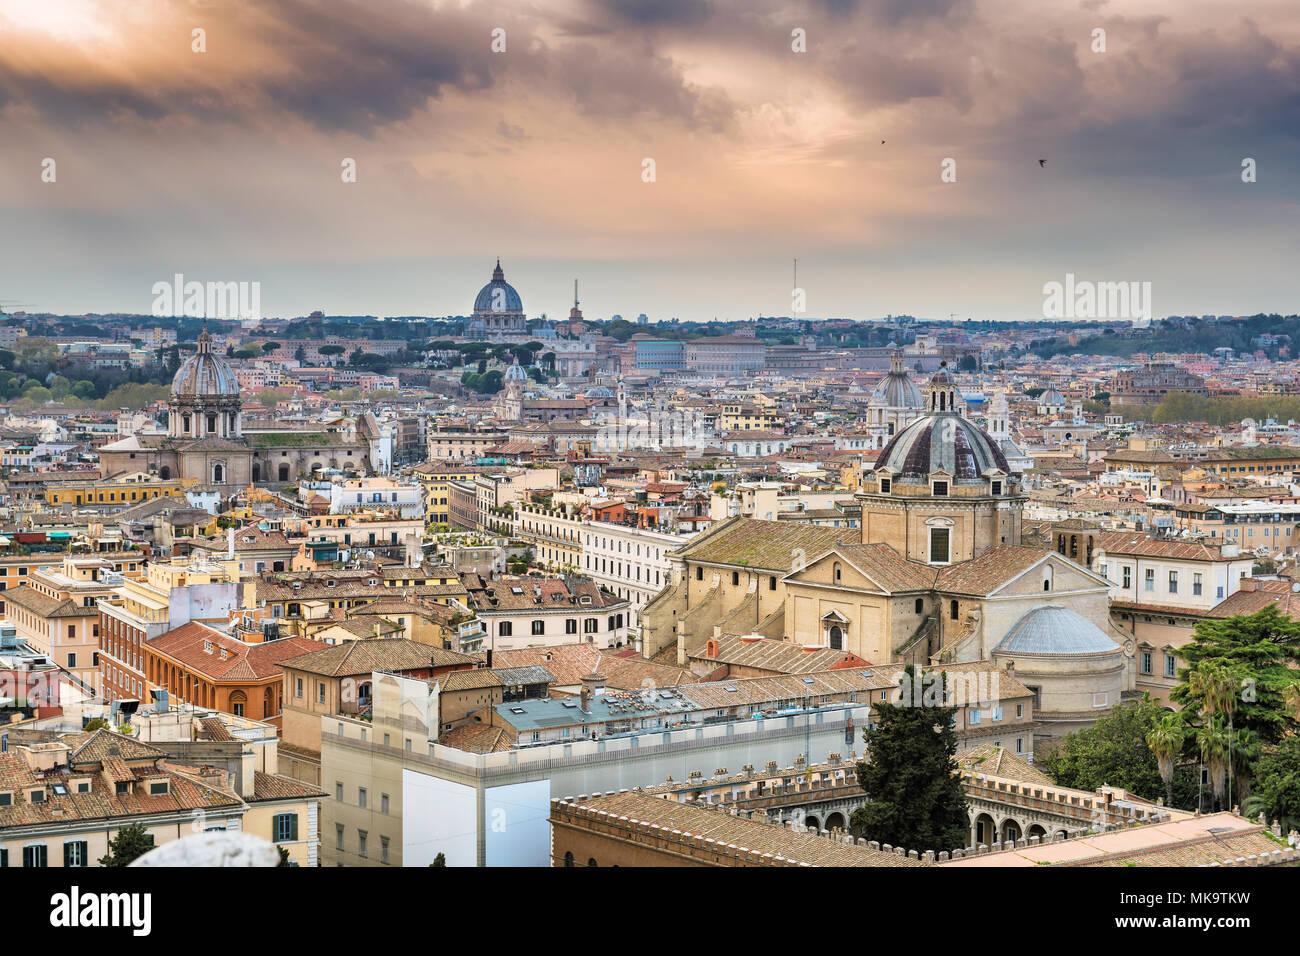 Rome skyline, Italy - Stock Image